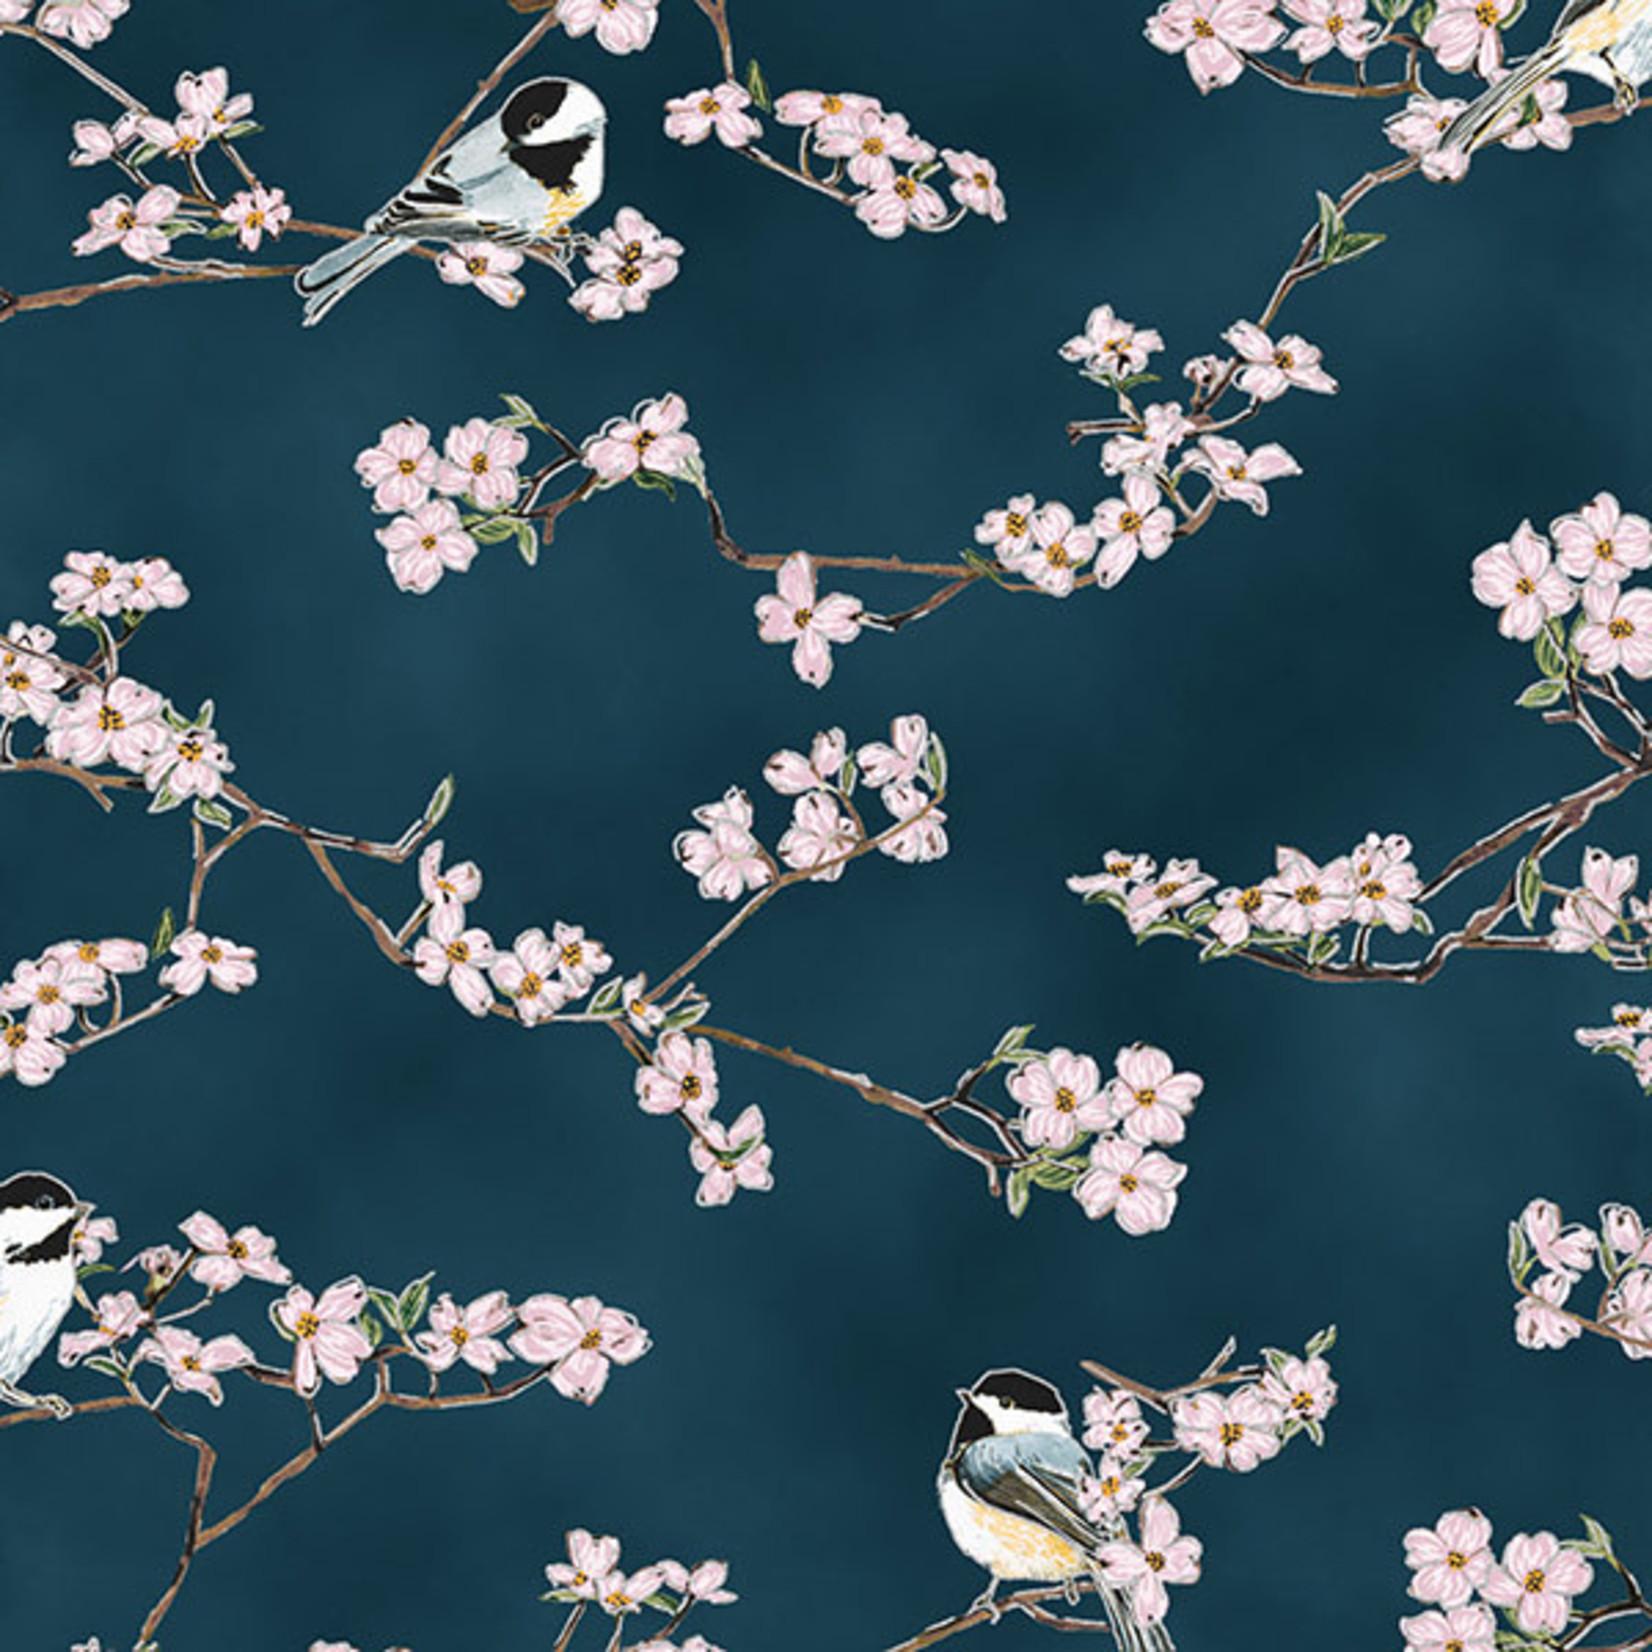 Hoffman Fabrics A little Birdie Told Me - Vogels en Bloesem - Marine Blauw